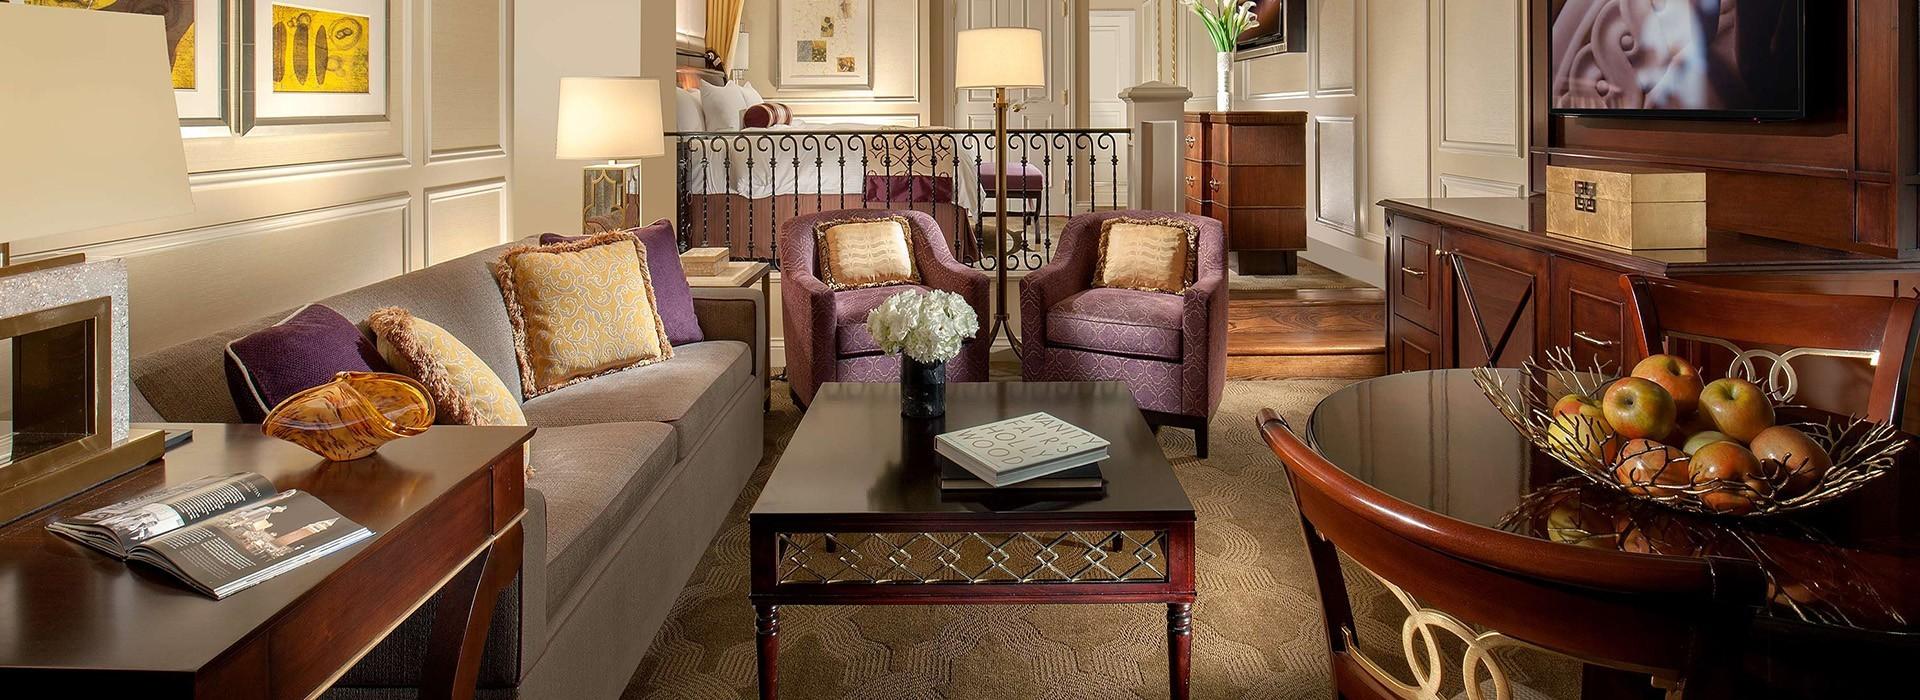 Furniture-Lab-Las-Vegas-Upholstery-0002